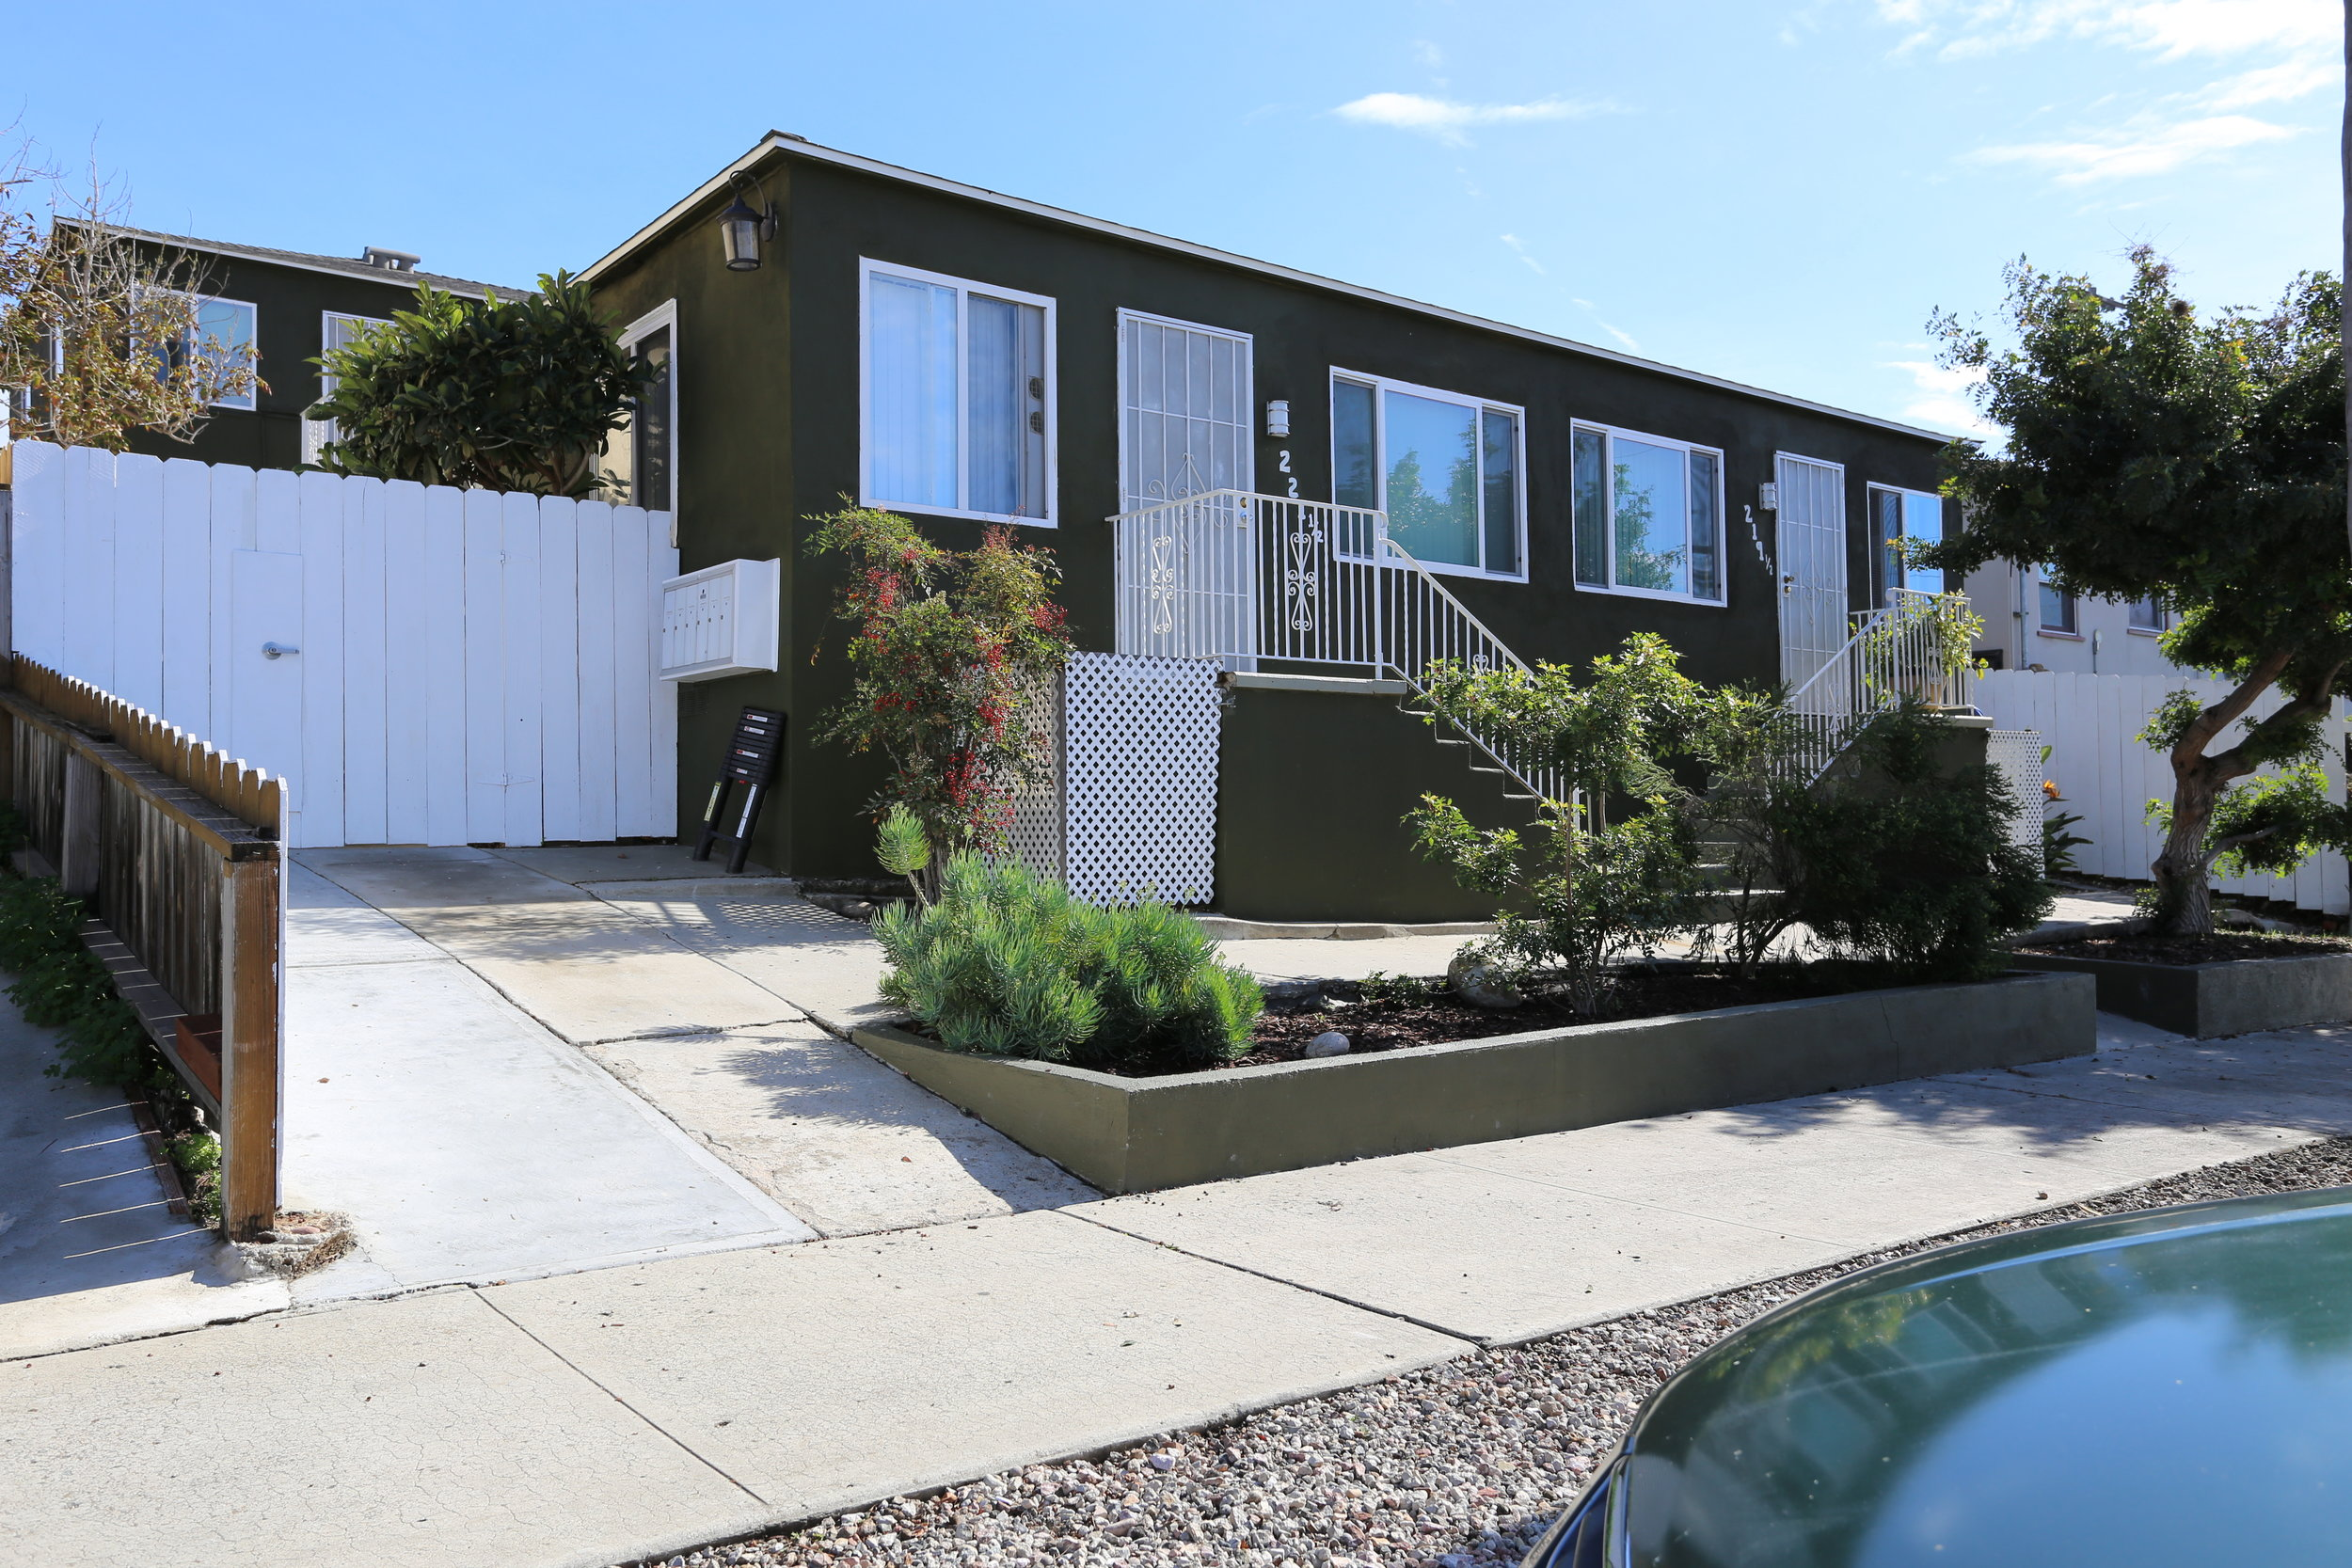 215 20th Street - Sherman Heights6 Units$1,300,000